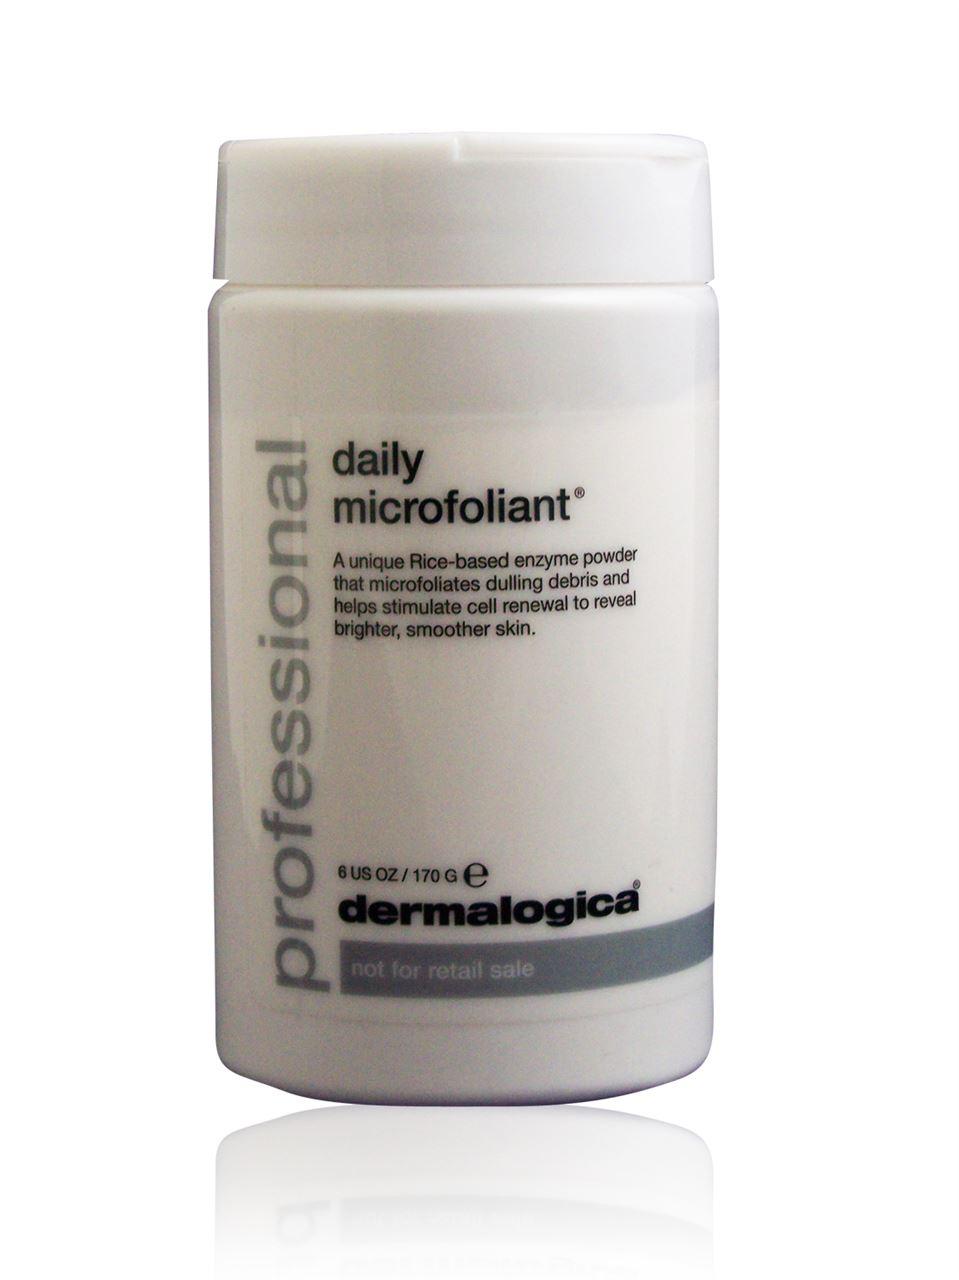 Daily Microfoliant Dermalogica